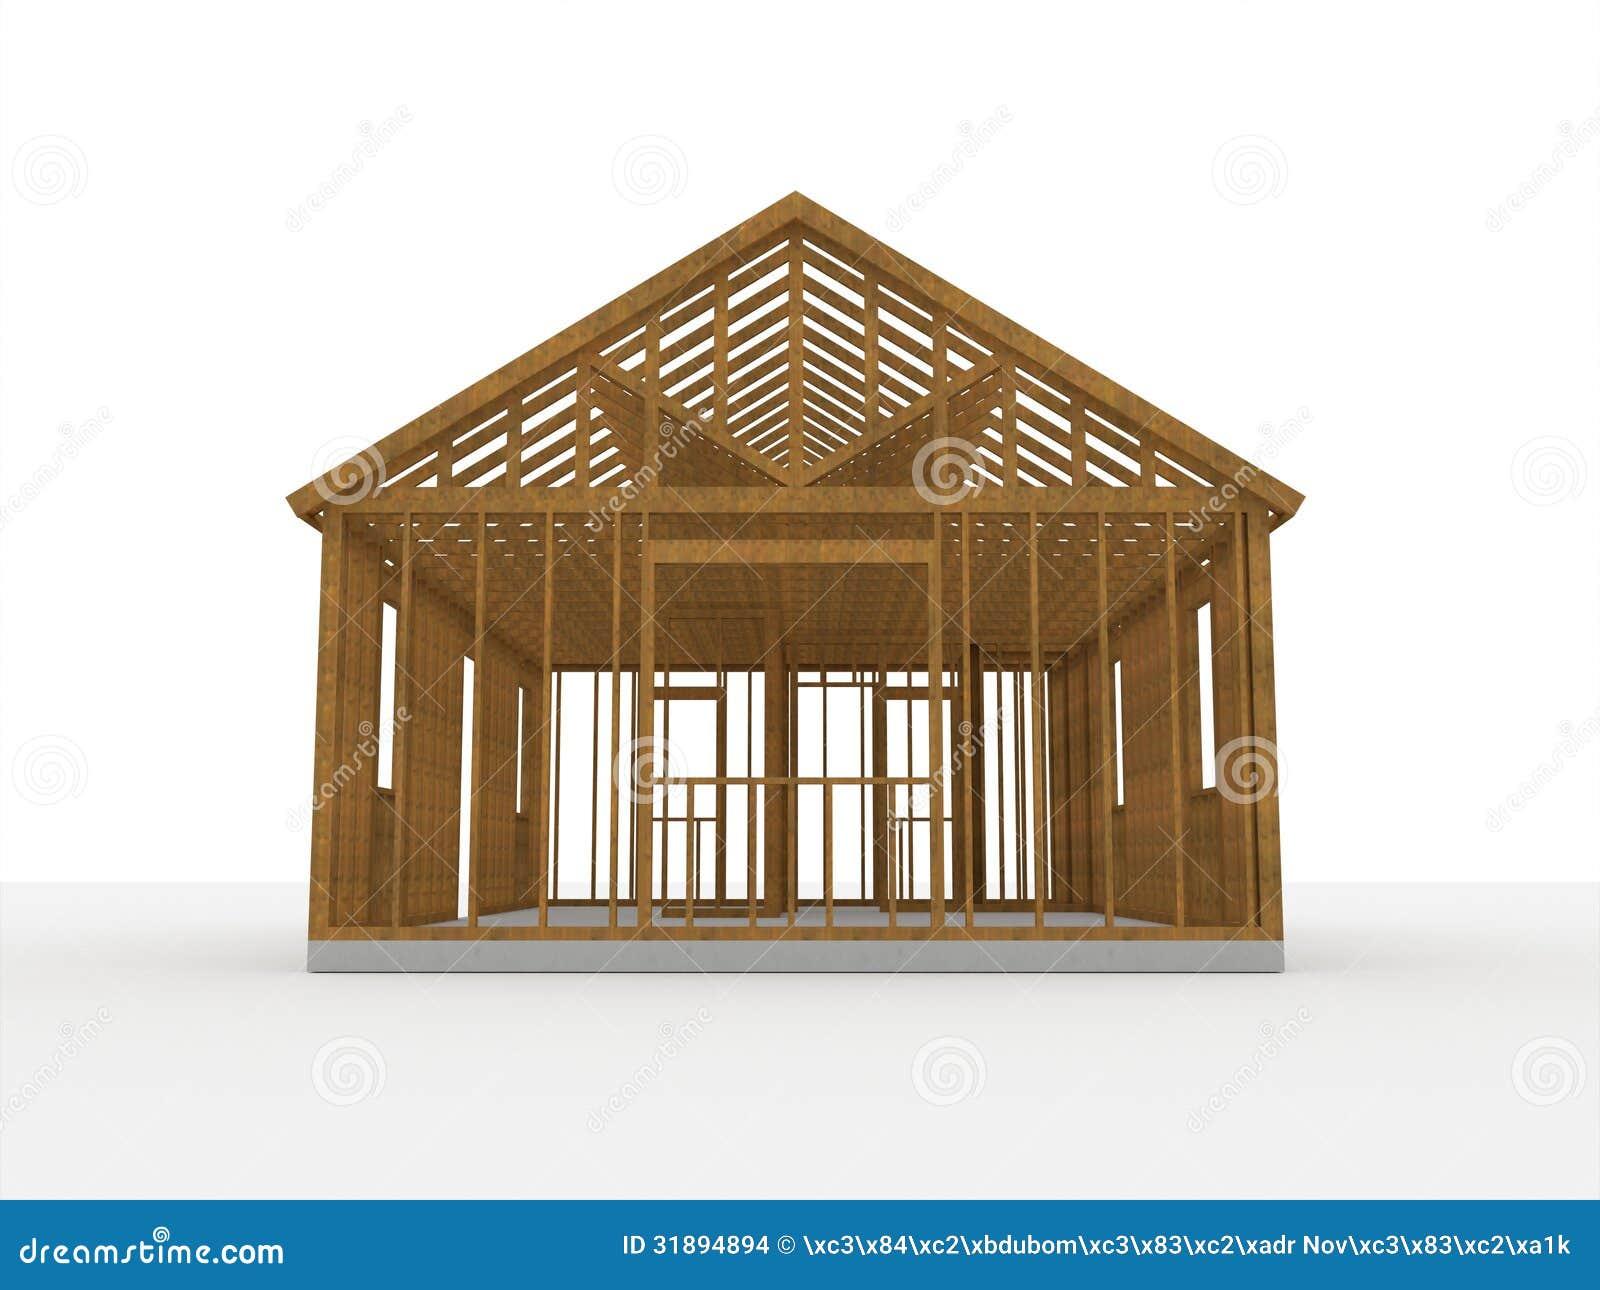 3d wood construction house stock illustration - Casas de madera balcan house ...